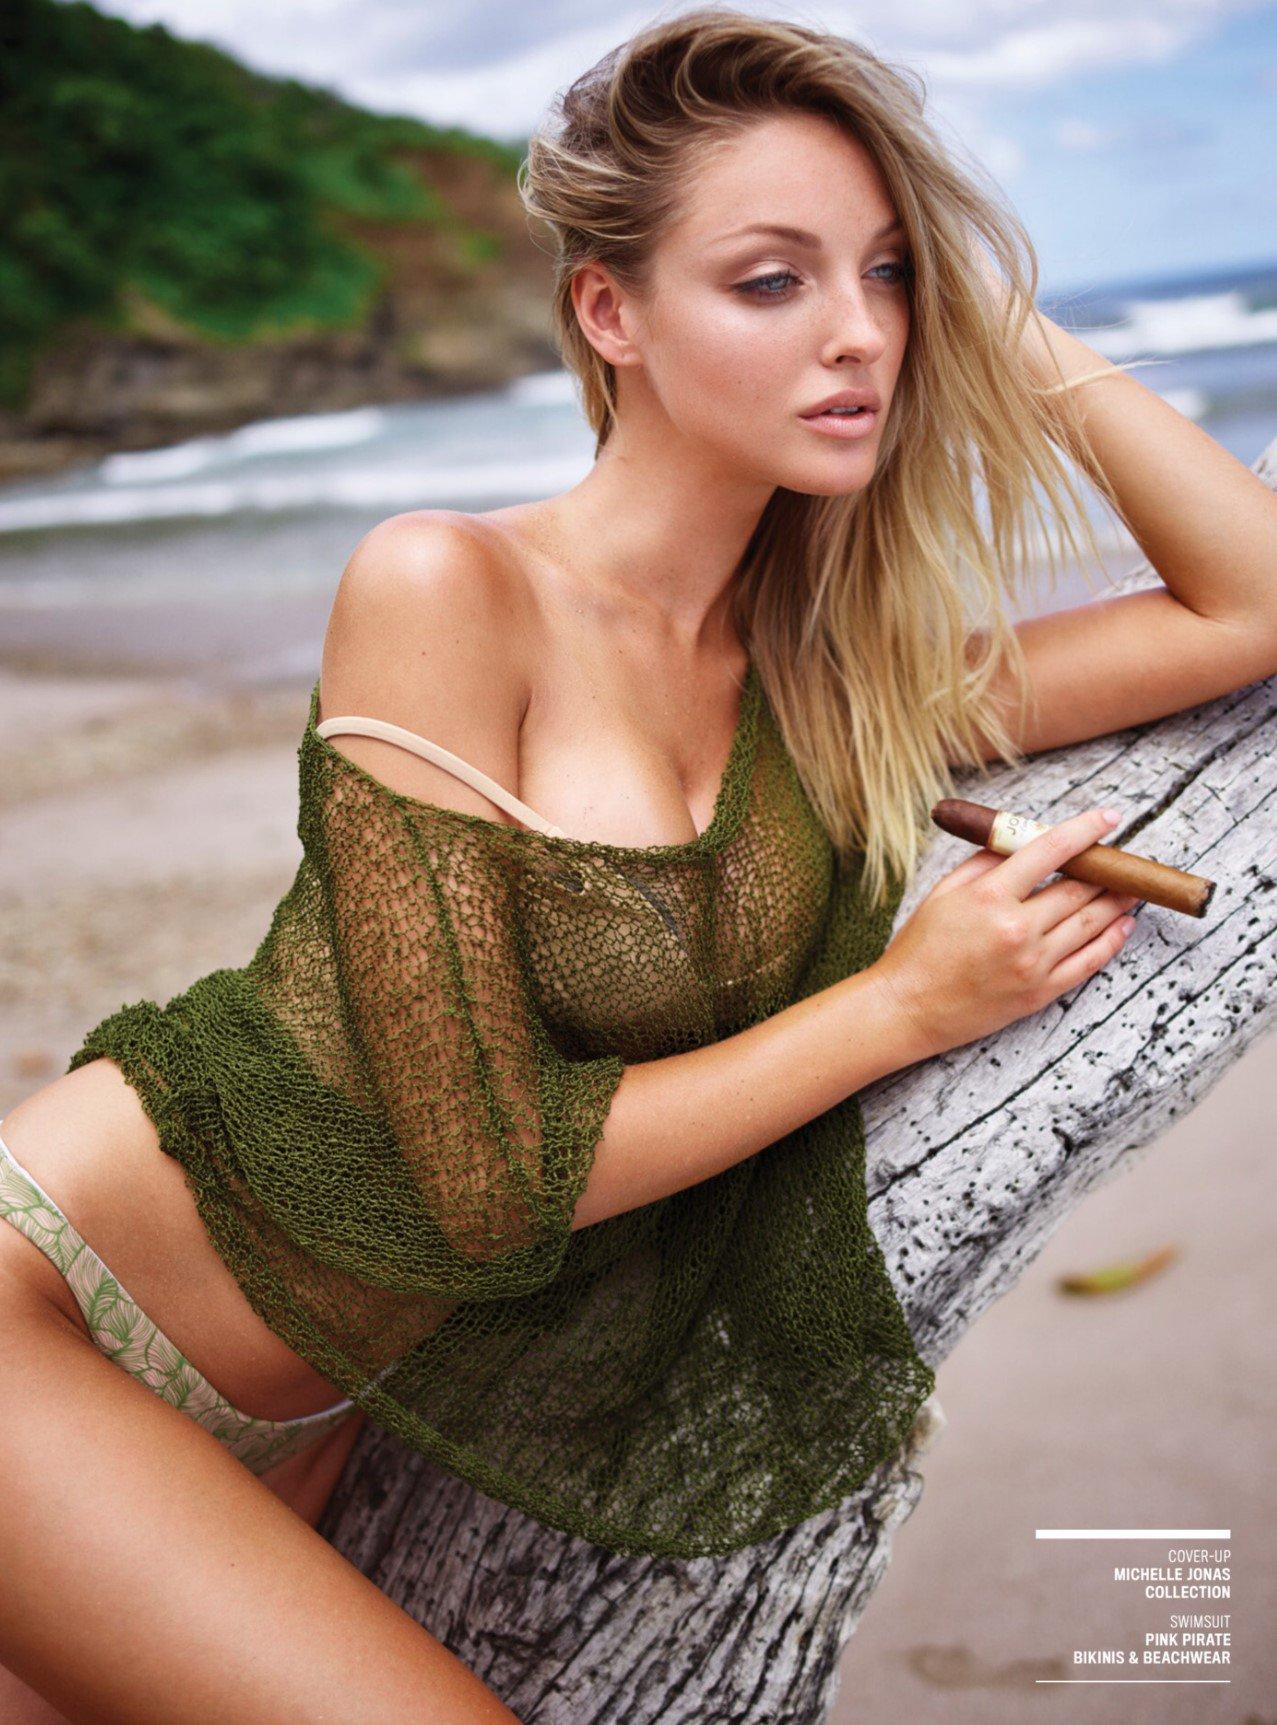 bikinis Cigarettes and